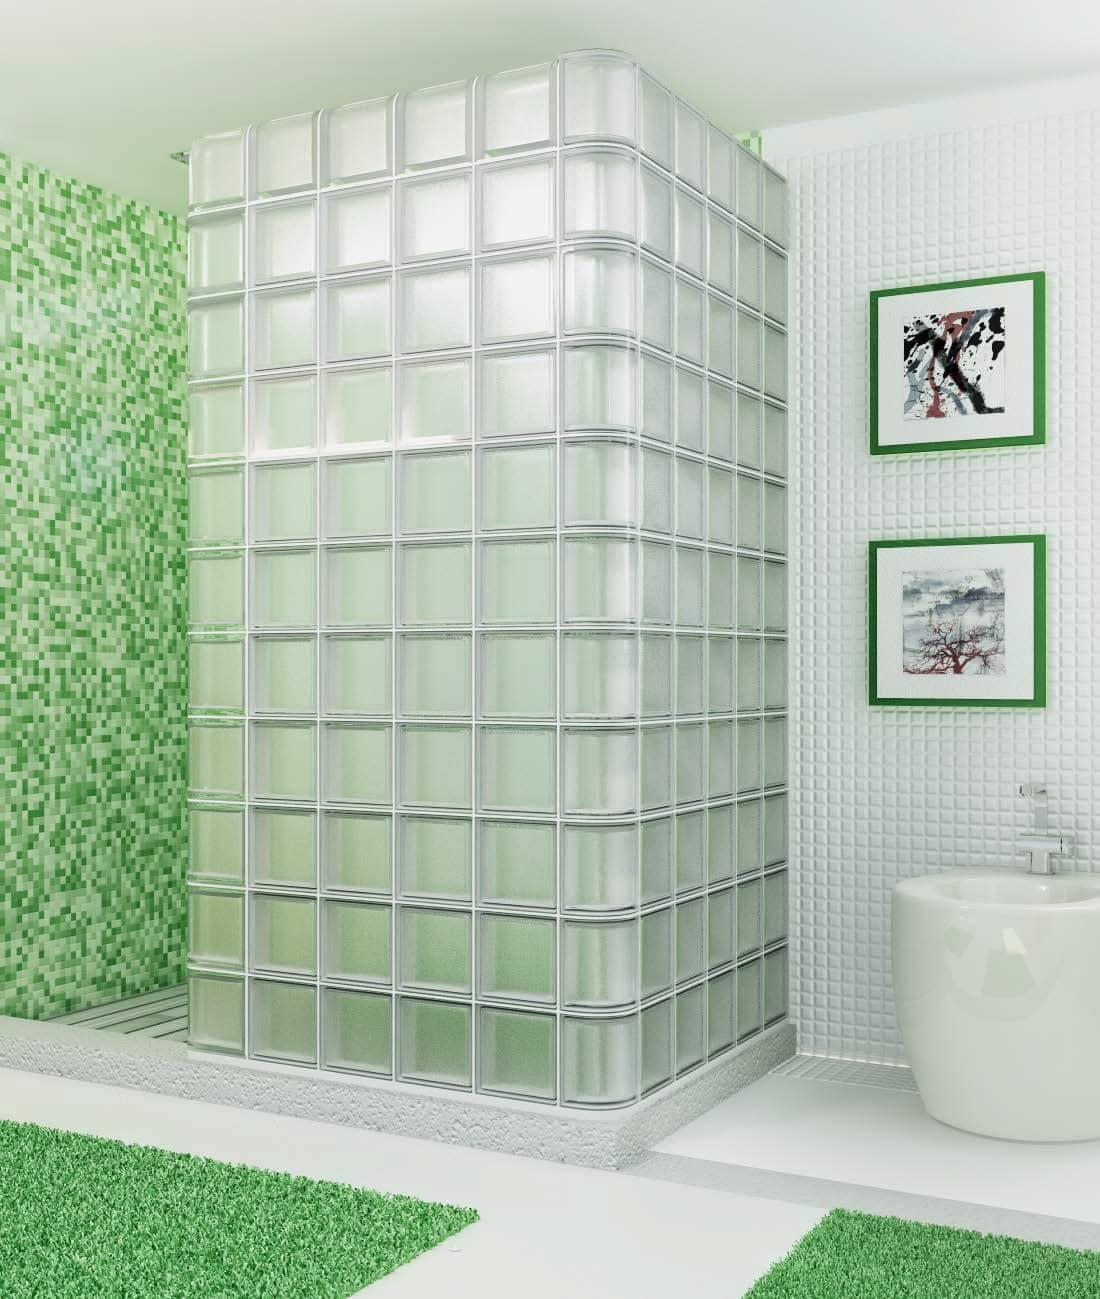 https://www.sevesglassblock.com/wp-content/uploads/2017/12/bathroom.jpg